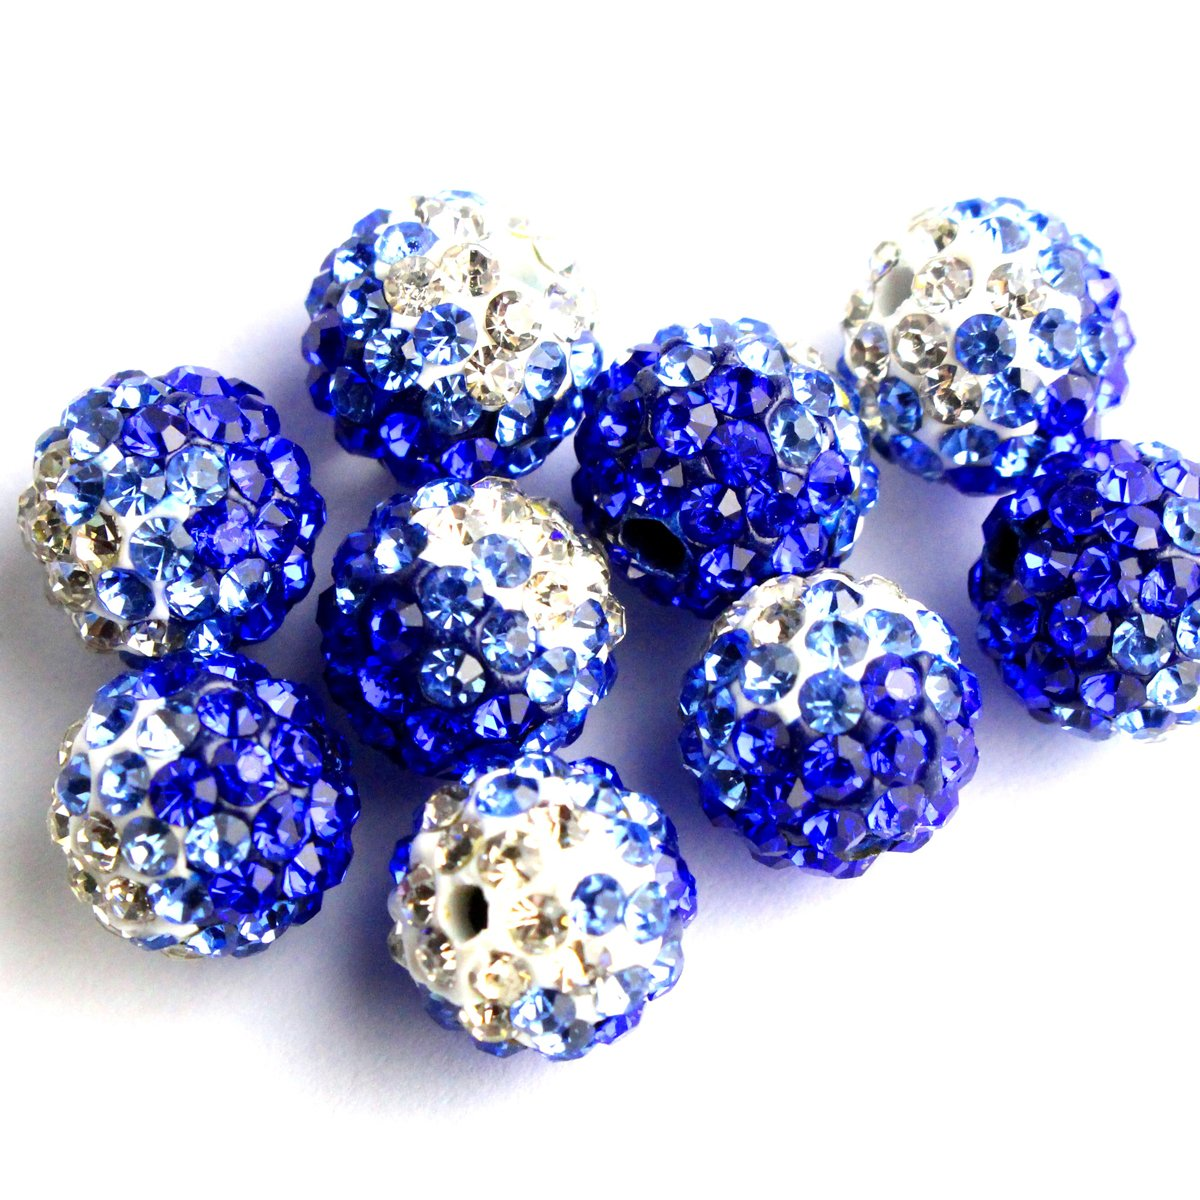 20pcs Dark blue transparent glass beads size 10mm